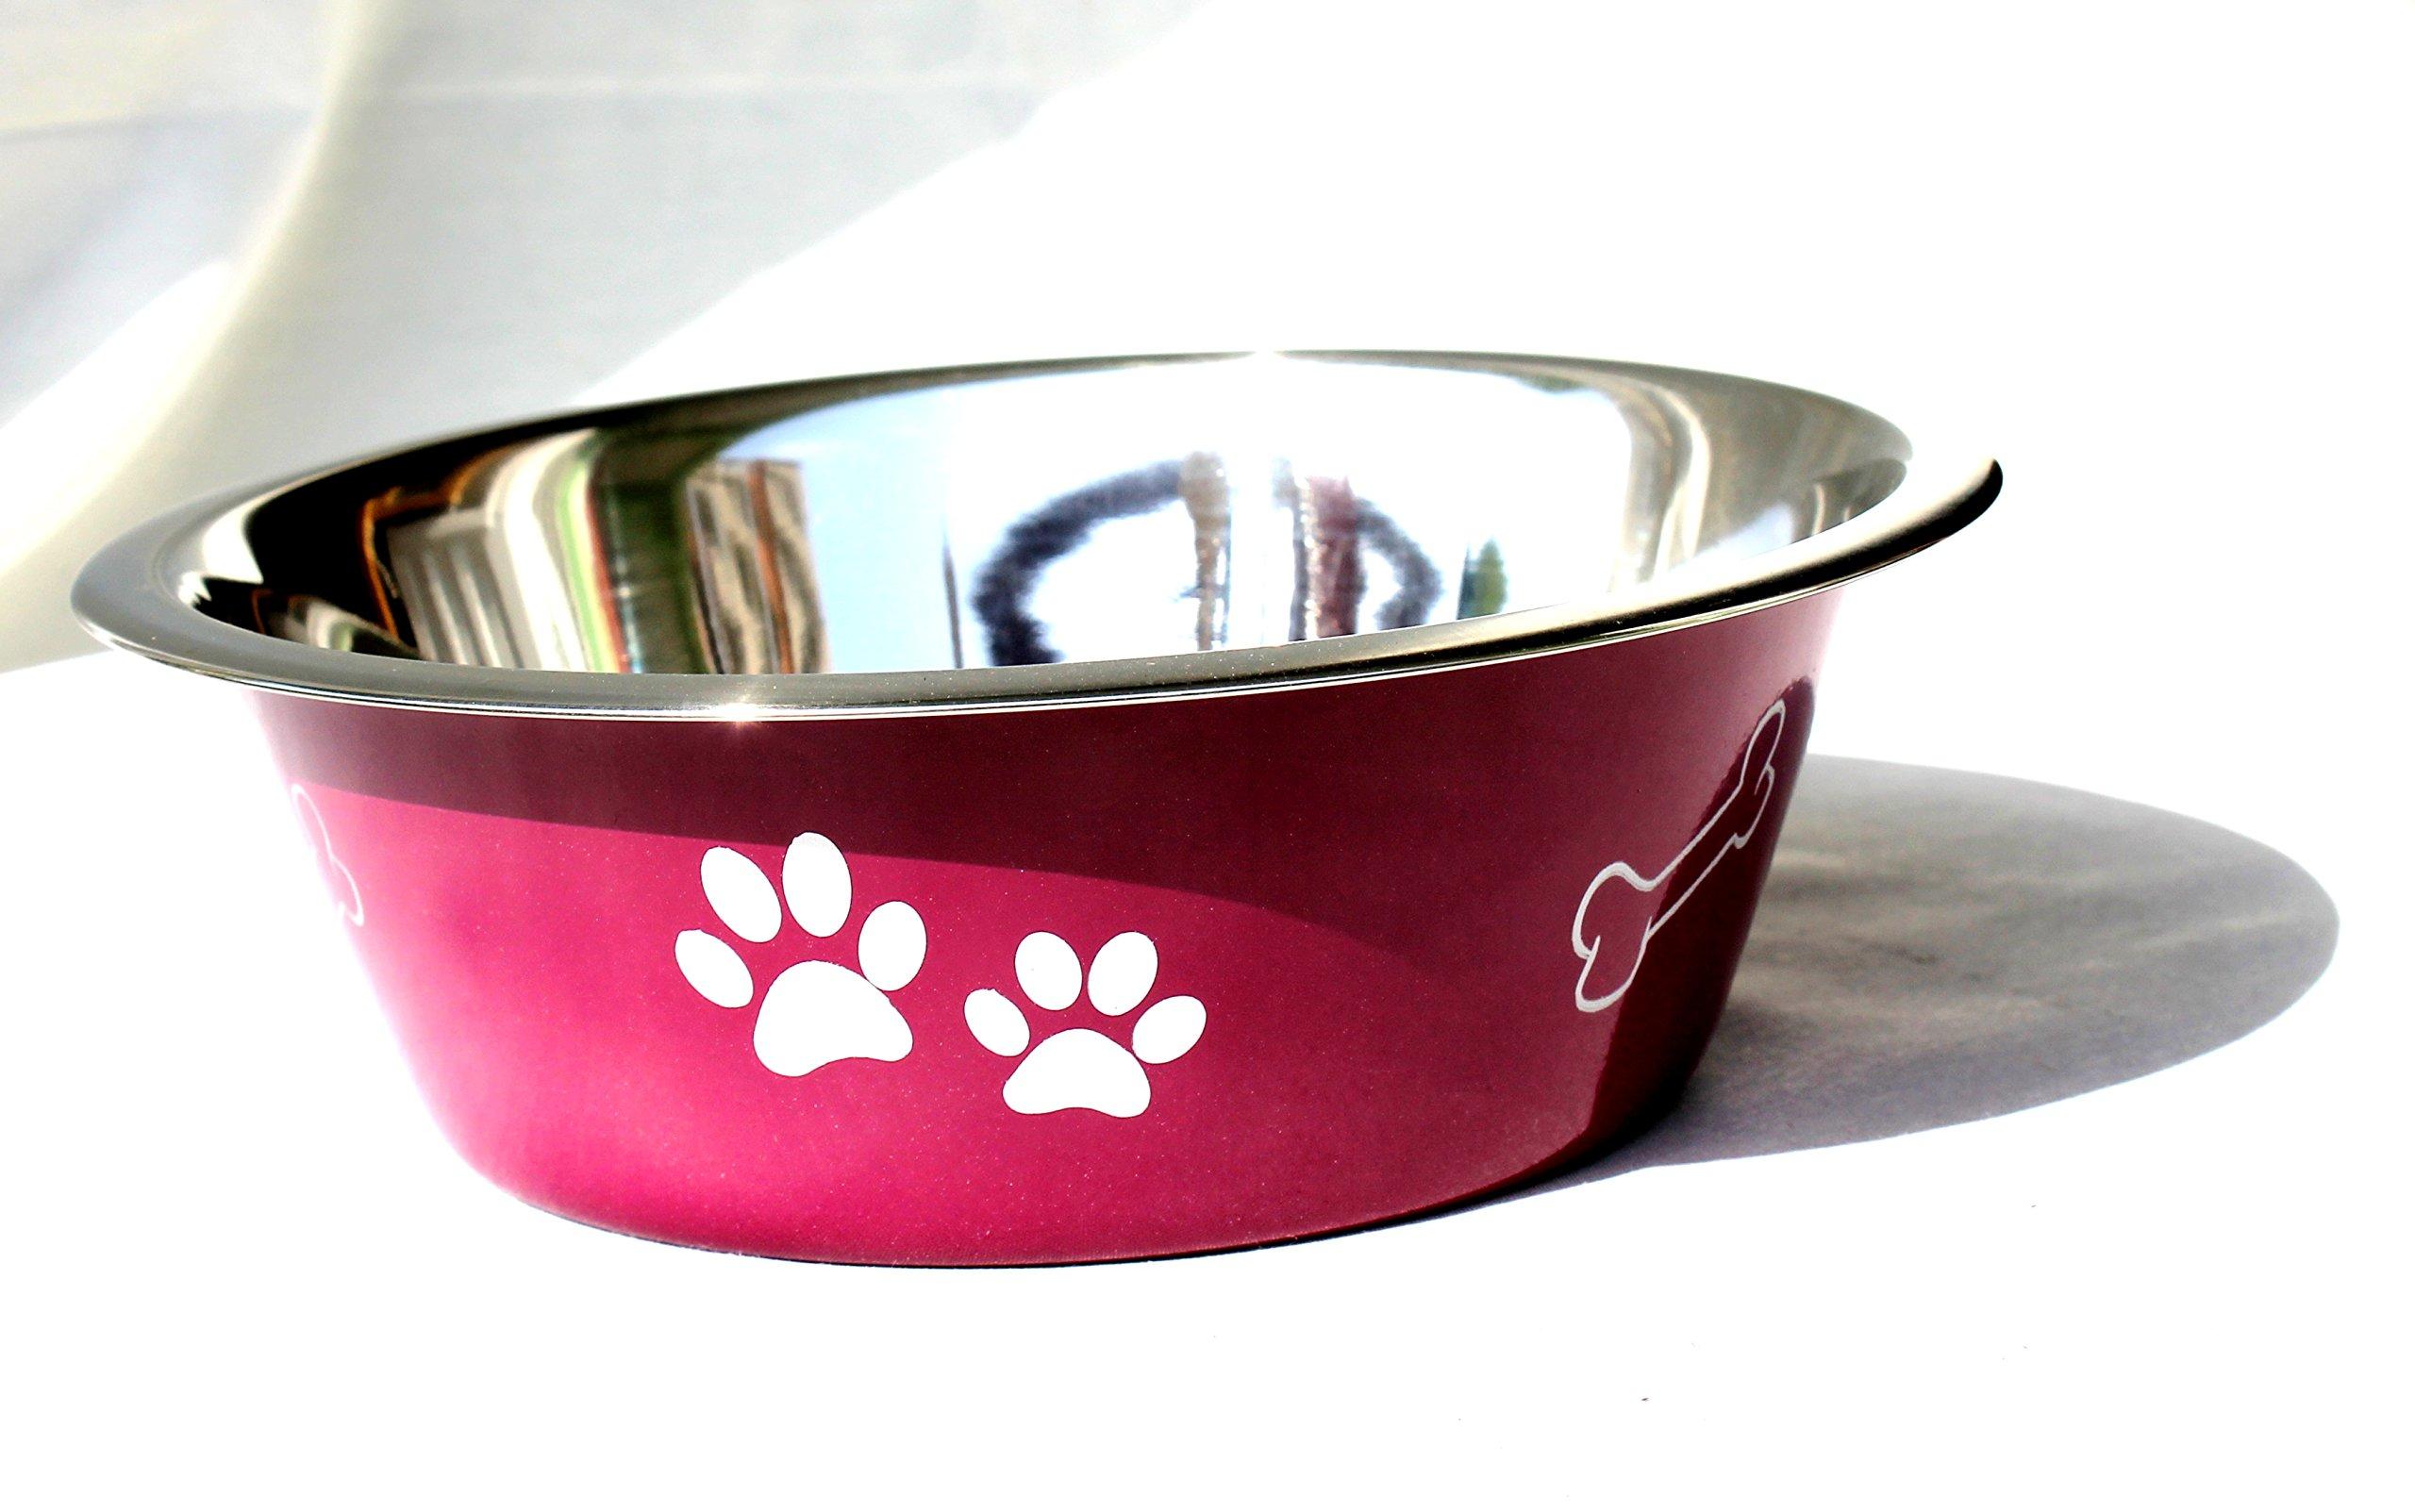 STREET CRAFT Stainless Steel Pet/Small Animals Feeding Bowl (Purple)